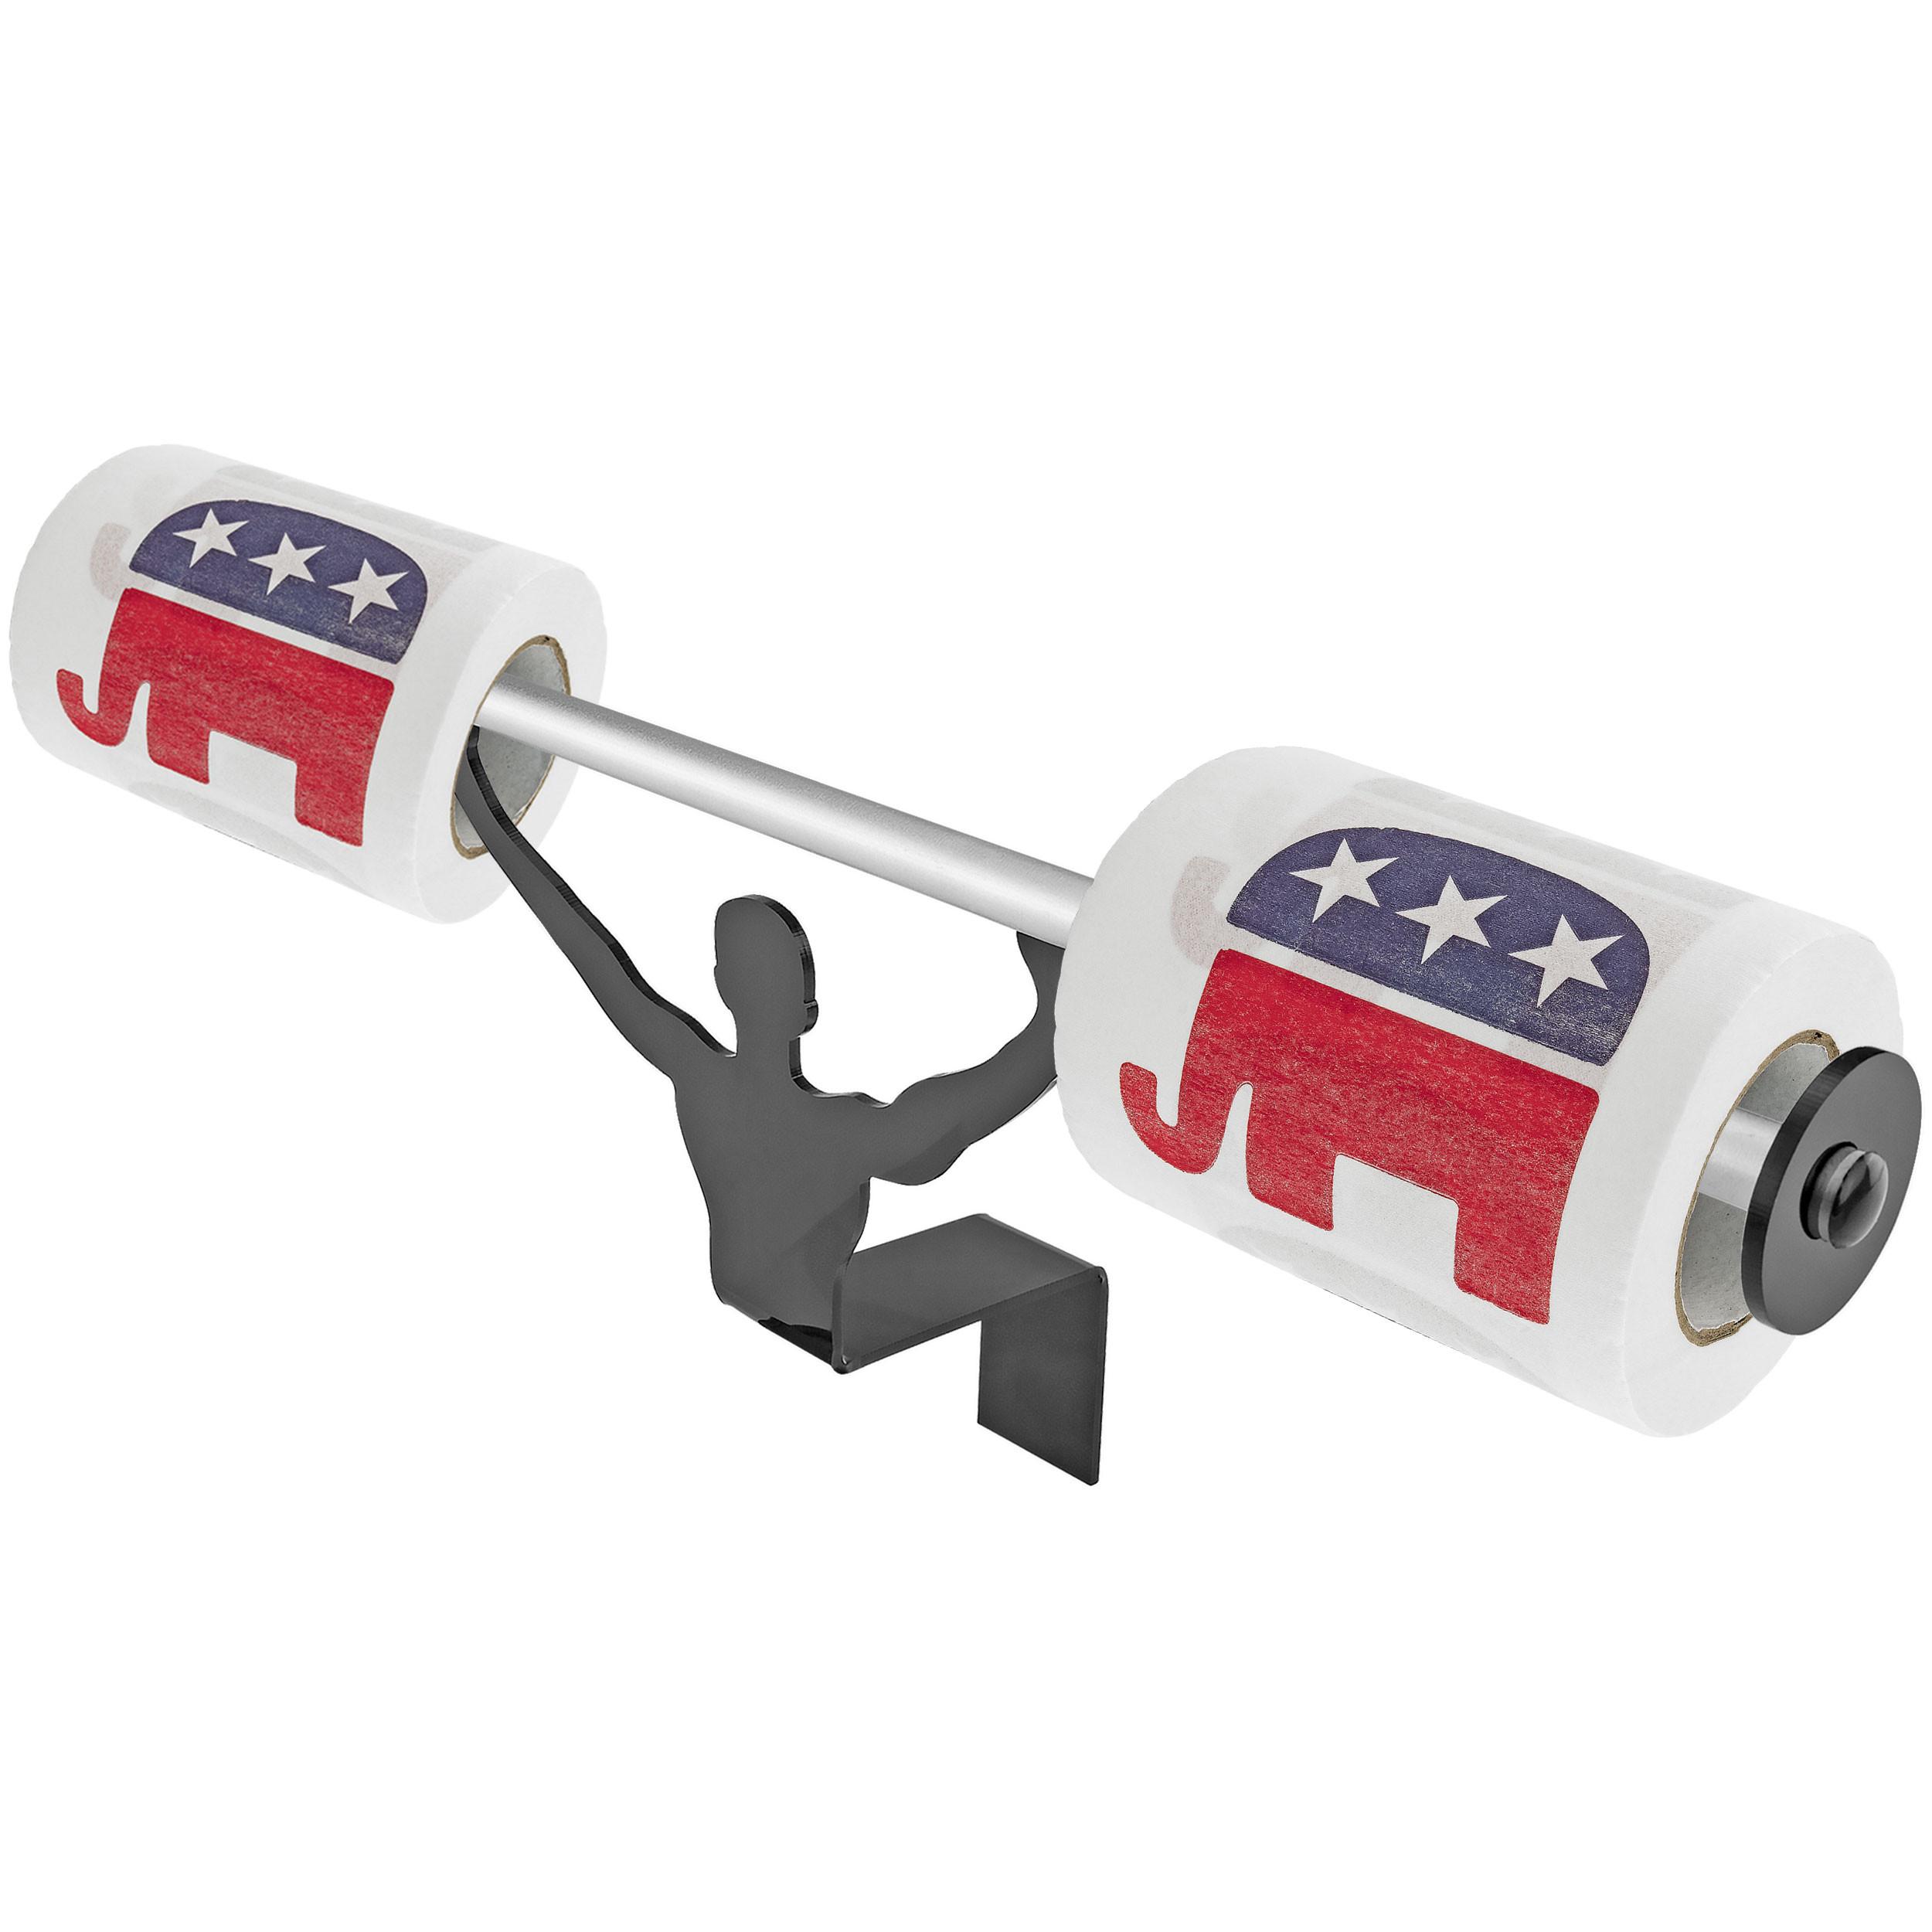 Fairly Odd Novelties Republican Party Logo Toilet Paper W/Strong Man Holder Gift Set